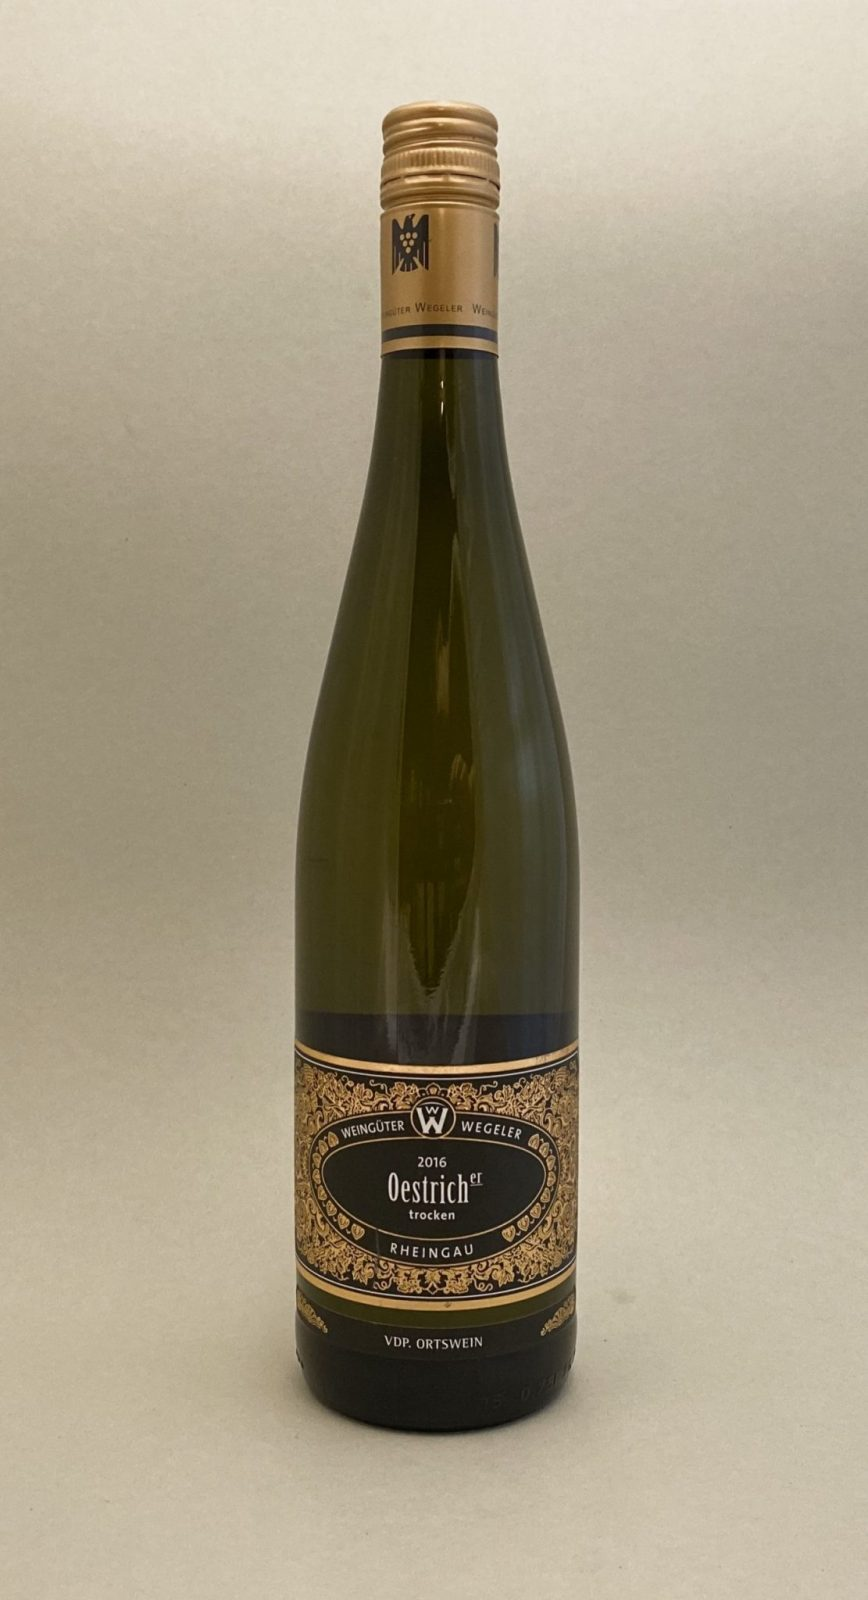 WEGELER Oestrich Riesling 2016, vinoteka Bratislava Sunny wines slnecnice mesto, petrzalka, vino biele z Nemecka